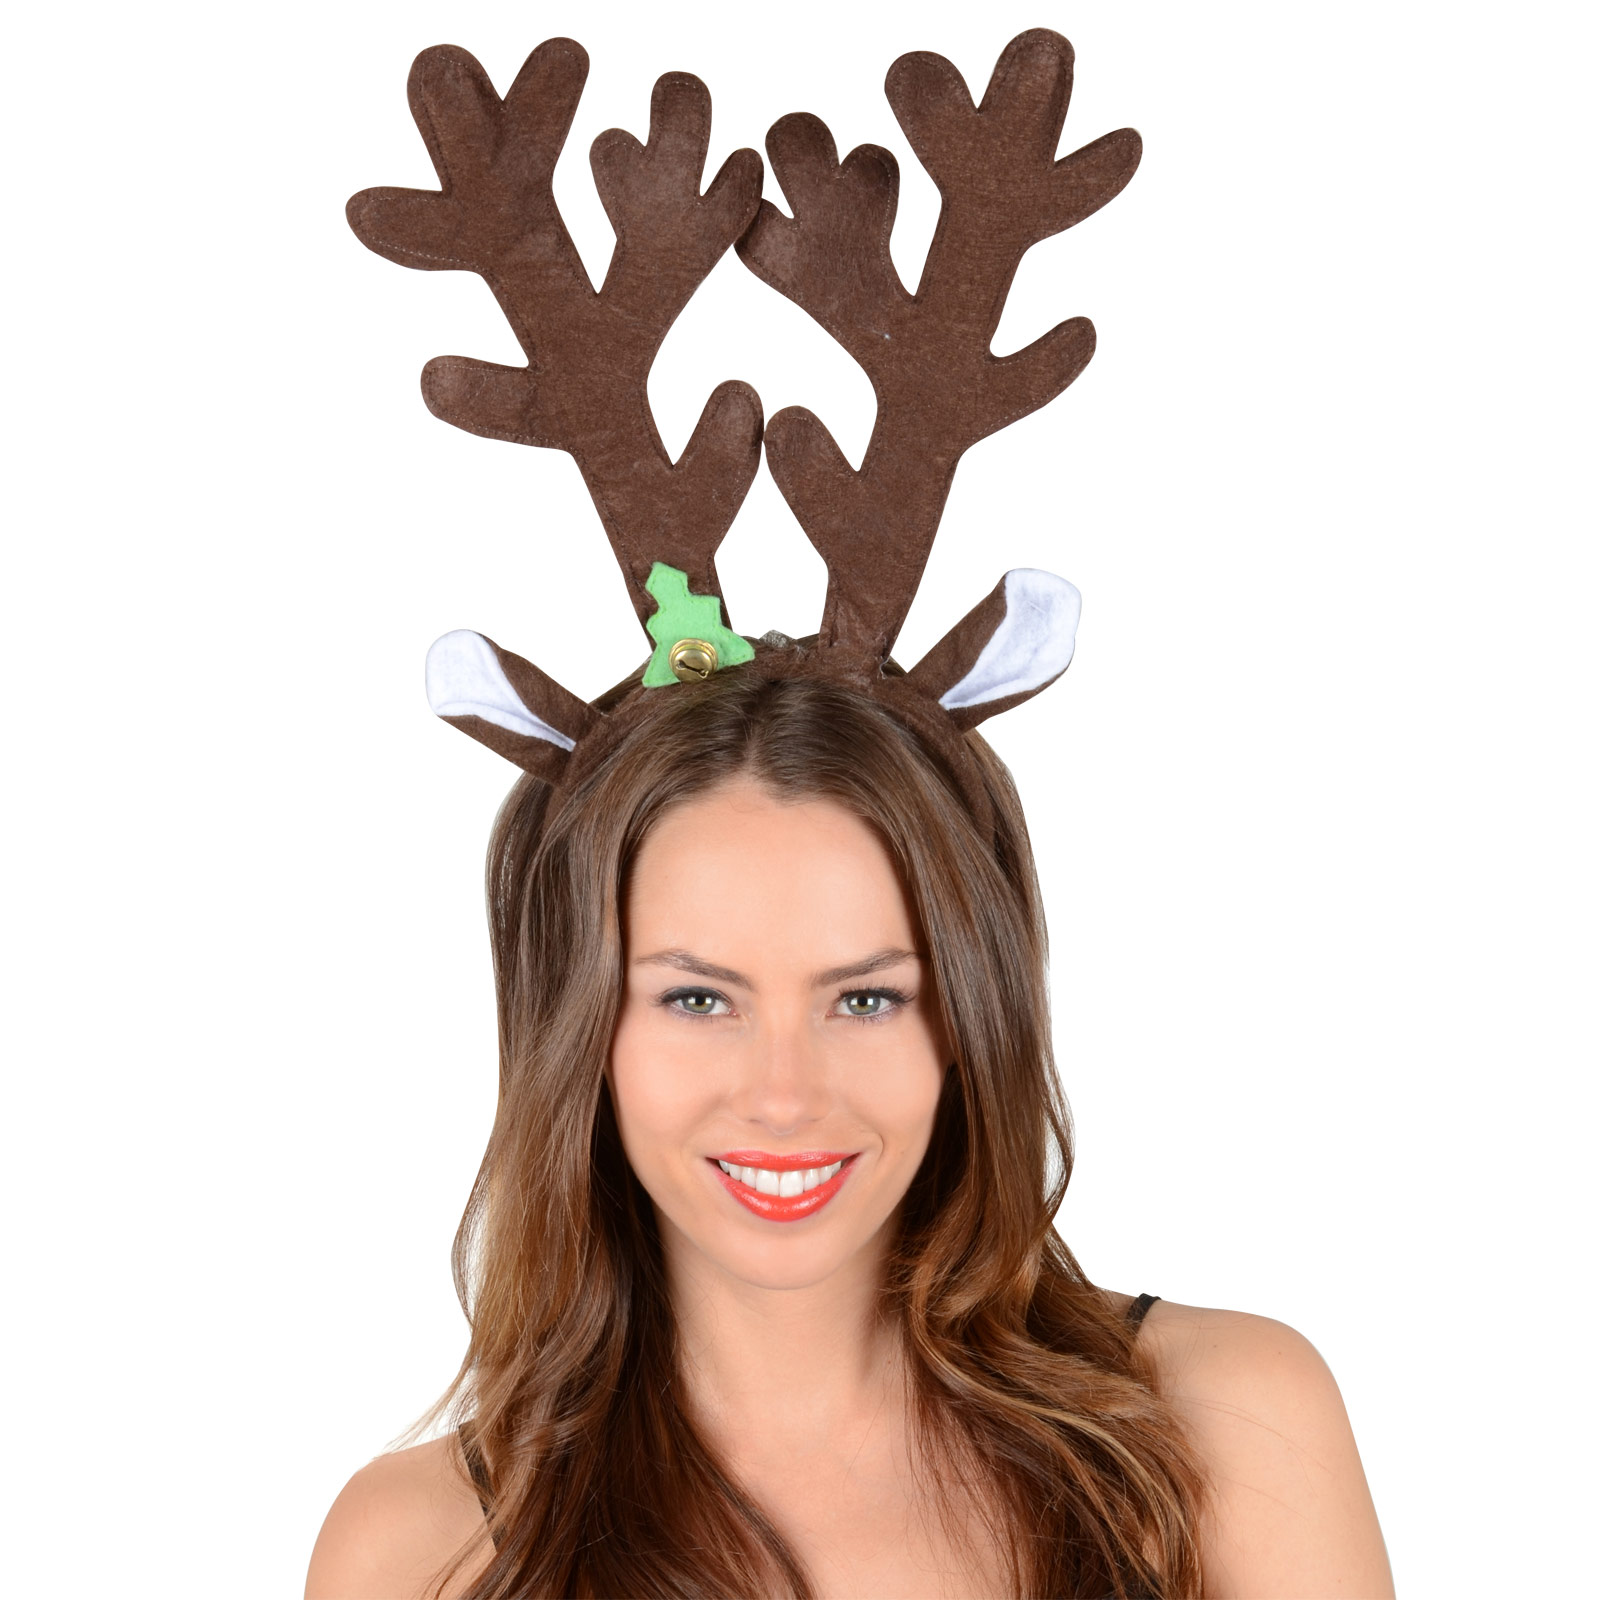 12 X Adults Festive Christmas Santa Elf Reindeer